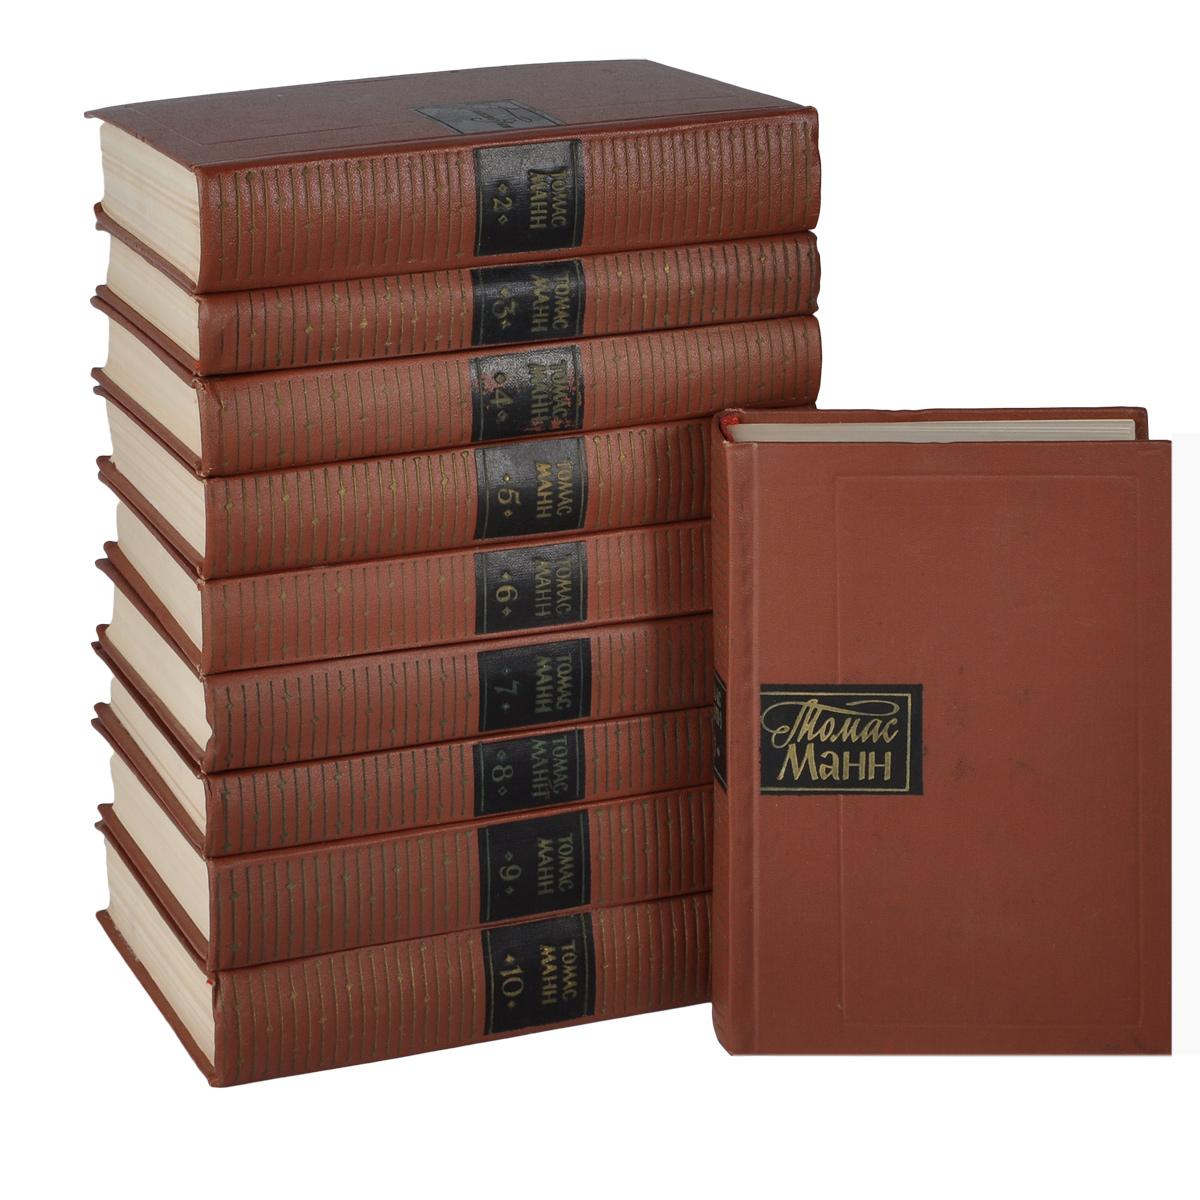 Томас Манн Томас Манн. Собрание сочинений (комплект из 10 книг) цены онлайн